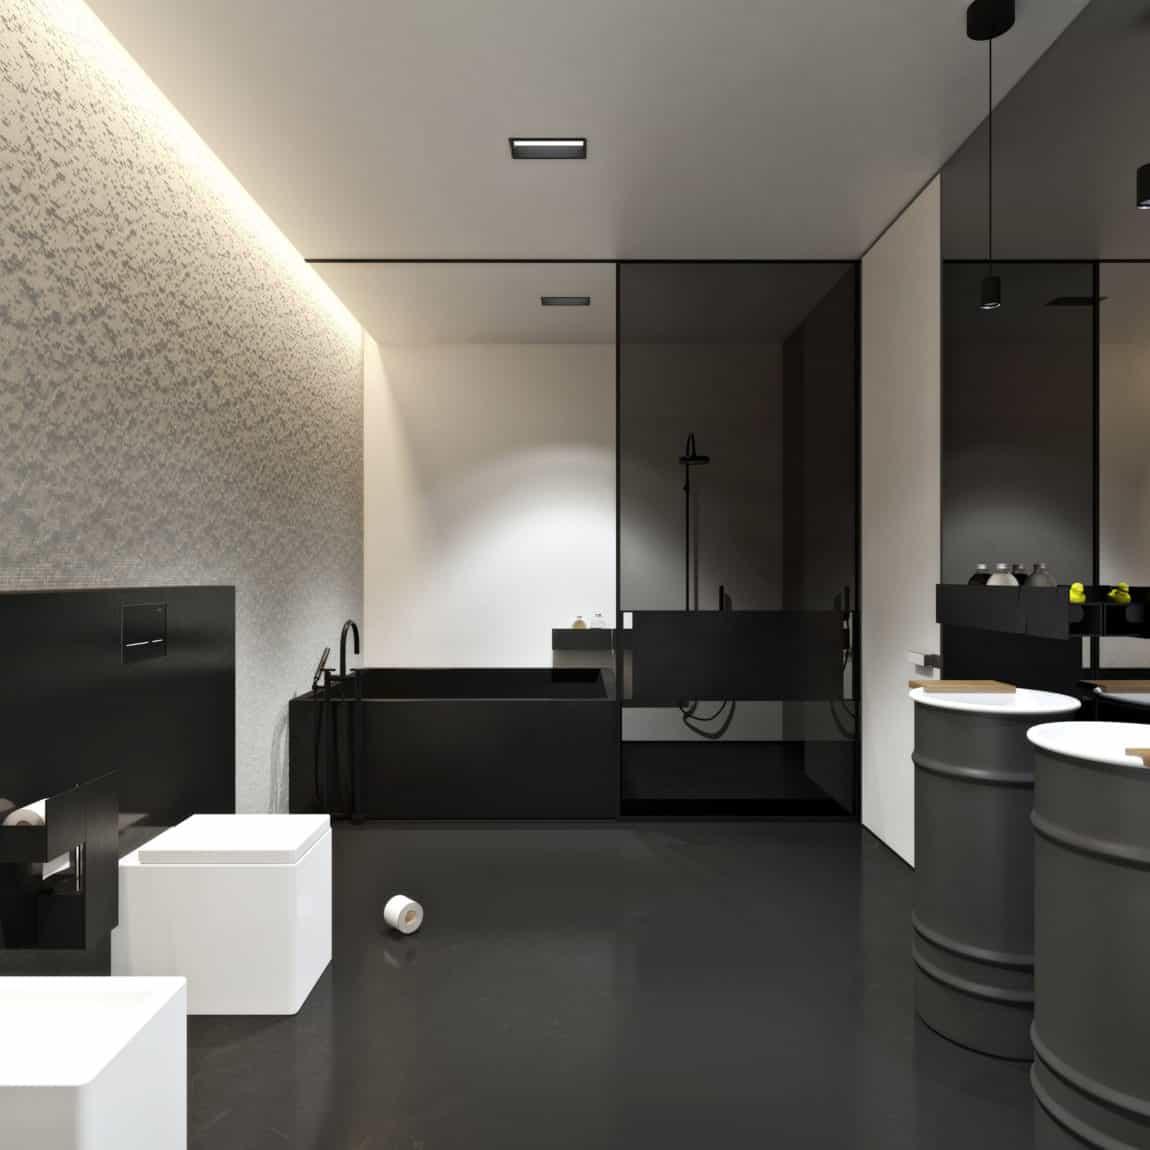 BL1 House by Igor Sirotov Architect (16)